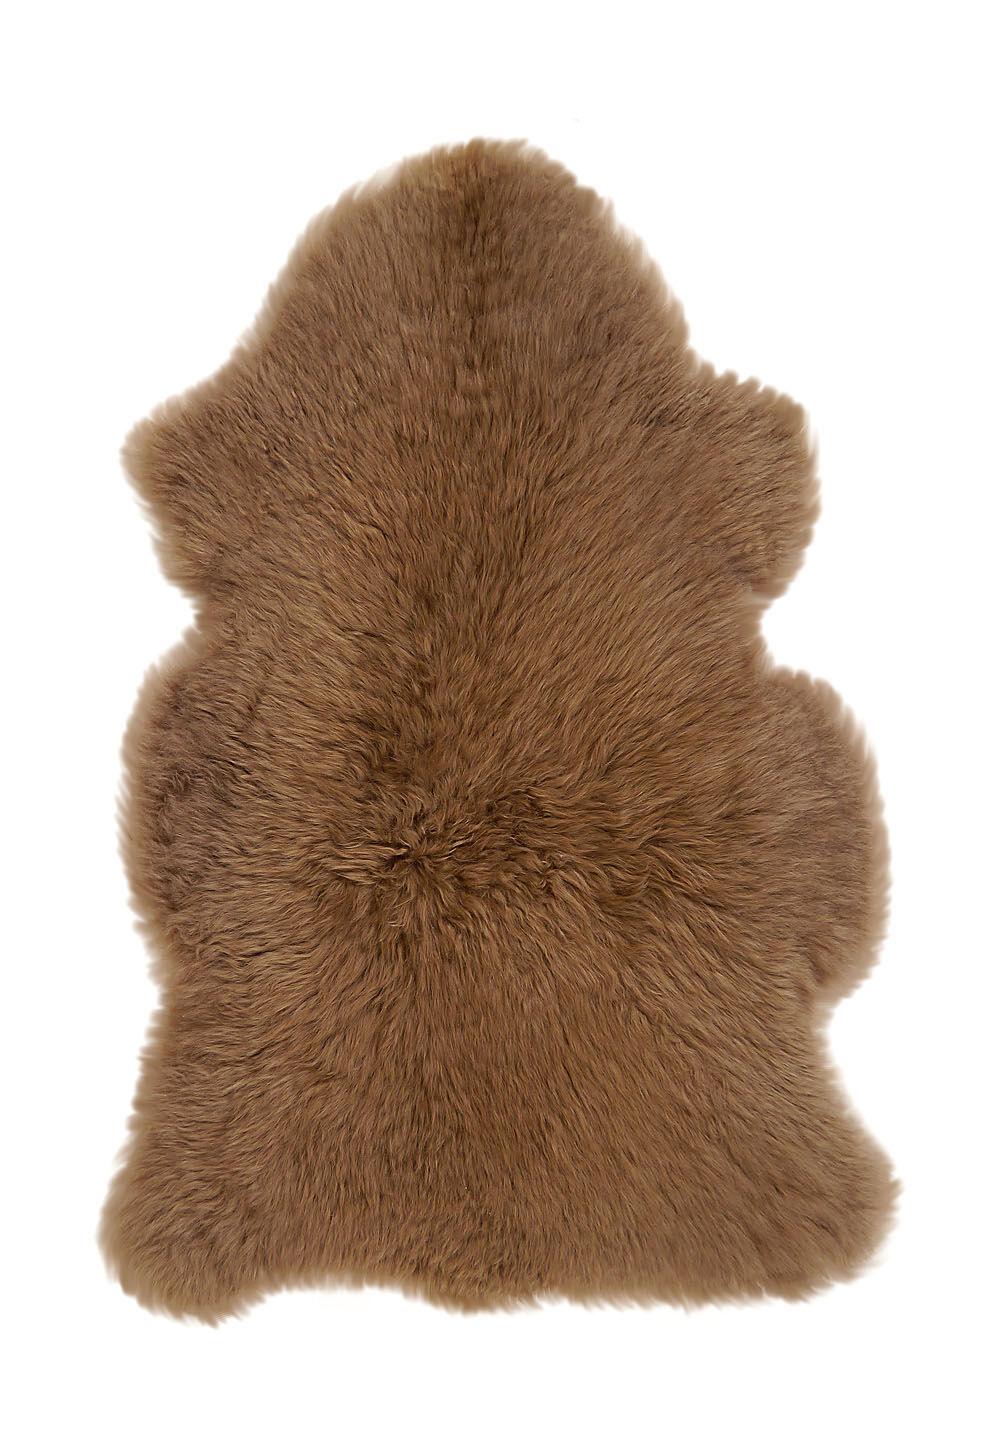 Kaiser Naturfellpro Dekorationsfell, Lammfell, L90-100 cm braun